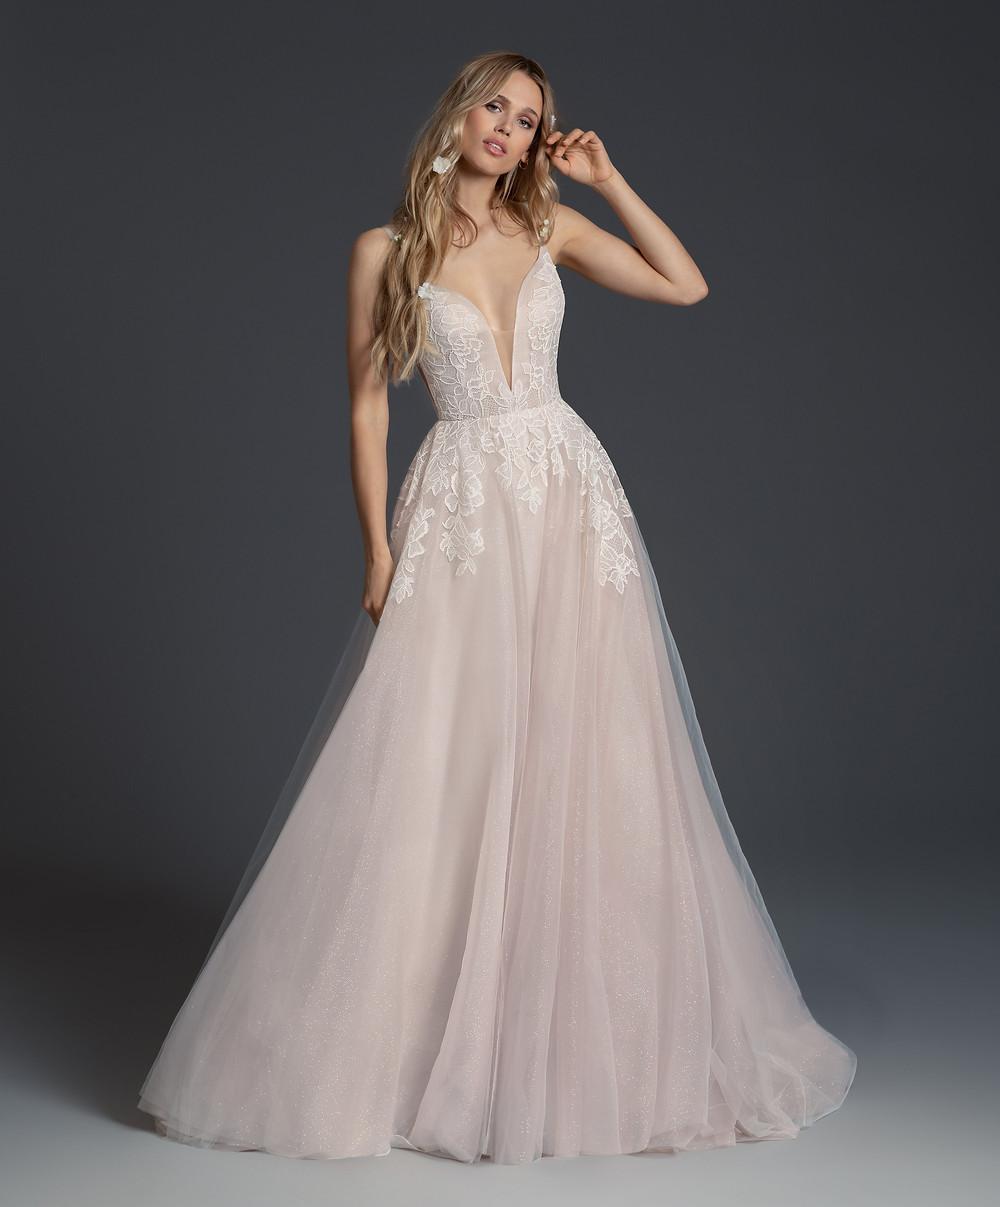 hayley paige bridal wedding dress jlm couture